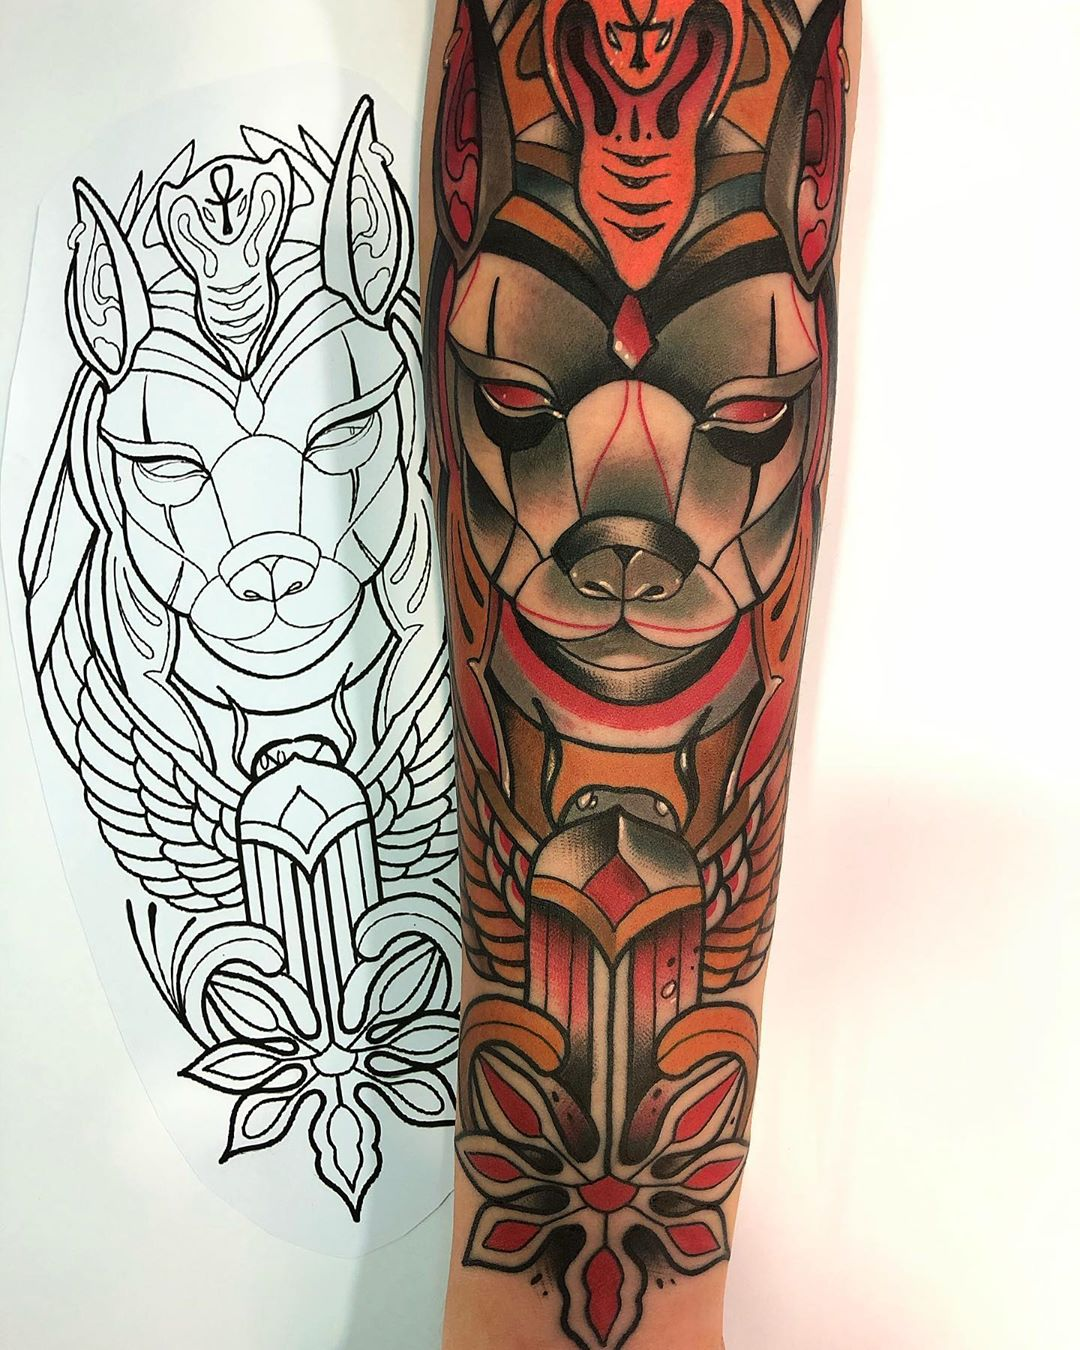 neotraditionaltattoo,followforfollow,berlin,followmeciudadreal,ciudadreal,tomelloso,almagro,puertollano,tatuajesenpuertollano,tatuajesendaimiel,ciudadrealtattoo,ciudadrealtatuajes,tatuajesciudadreal,follow,ciudadrealtatuajes,puertollano,tattooers,besttattooers,juantabasco,ciudadrealsetatua,ink,tatuajes,realismo,realistictattoo,ciudadrealtattoo,tatuajesenpuertollano,traditionaltattoos,castillalamancha,ink,tattooart,zurichtattoo,daimiel,inkedgirls,inkig,ink,inktattoosub